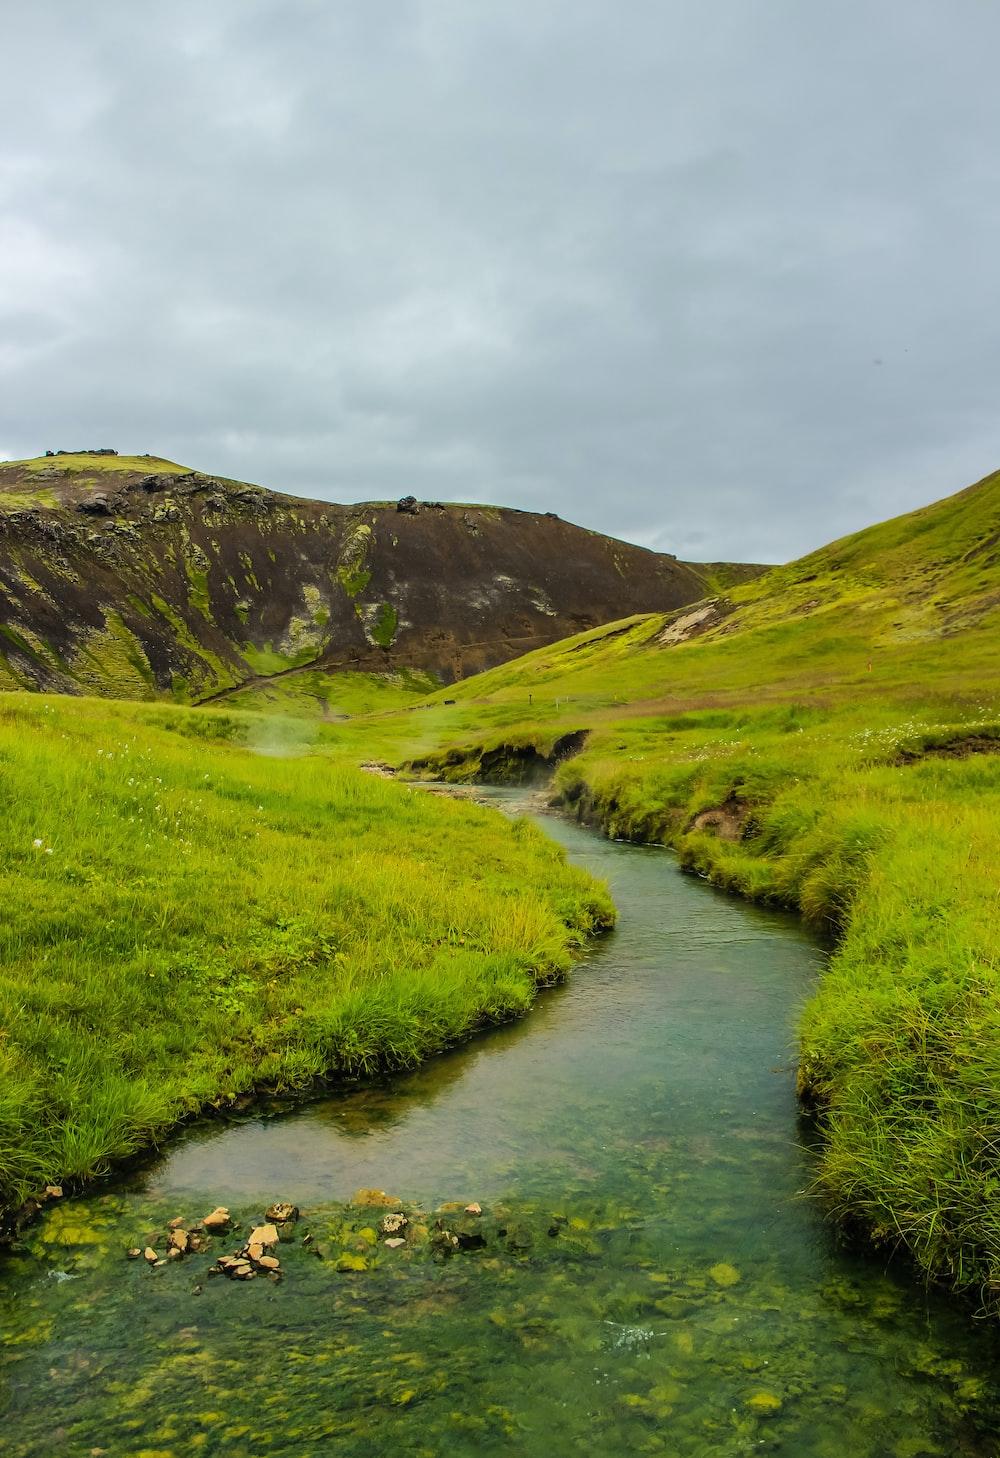 green grass field near river under cloudy sky during daytime